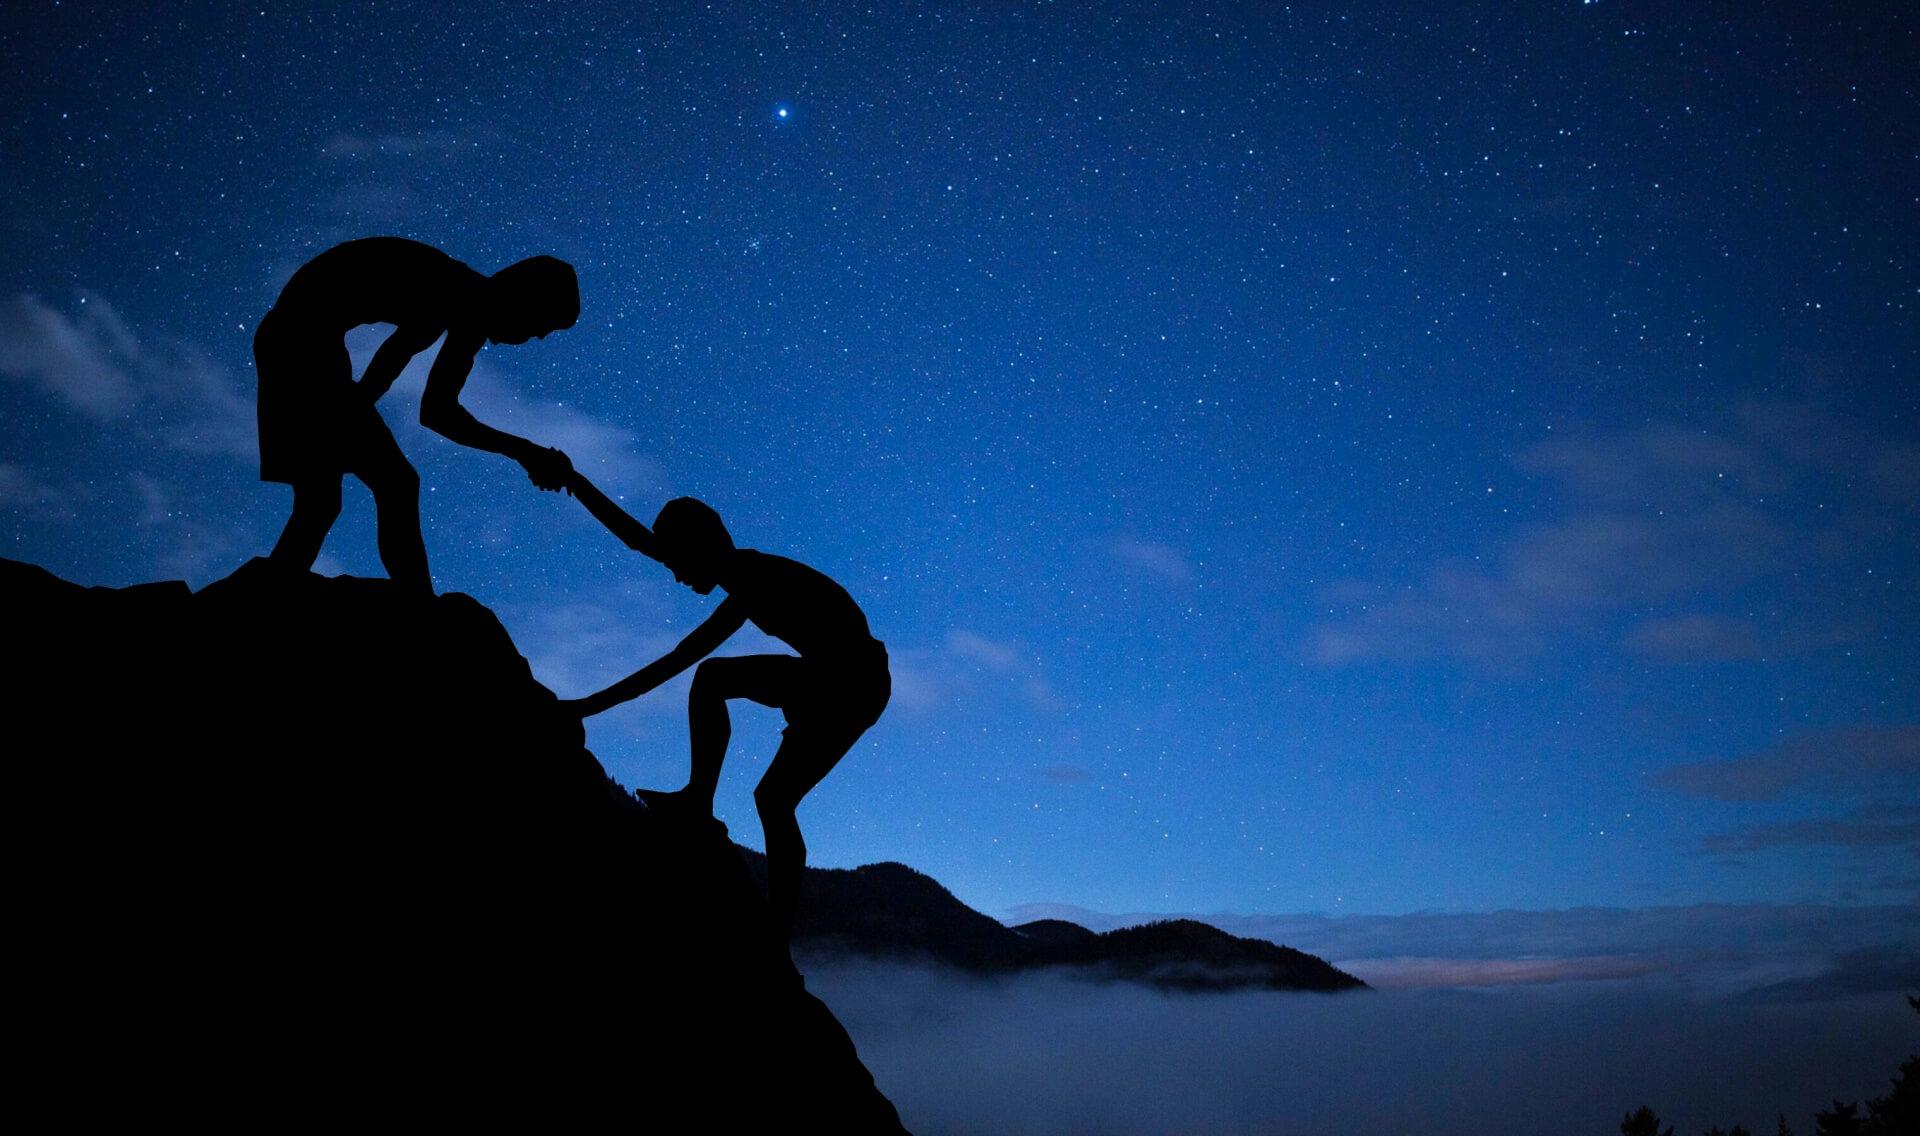 Lending a hand while climbing